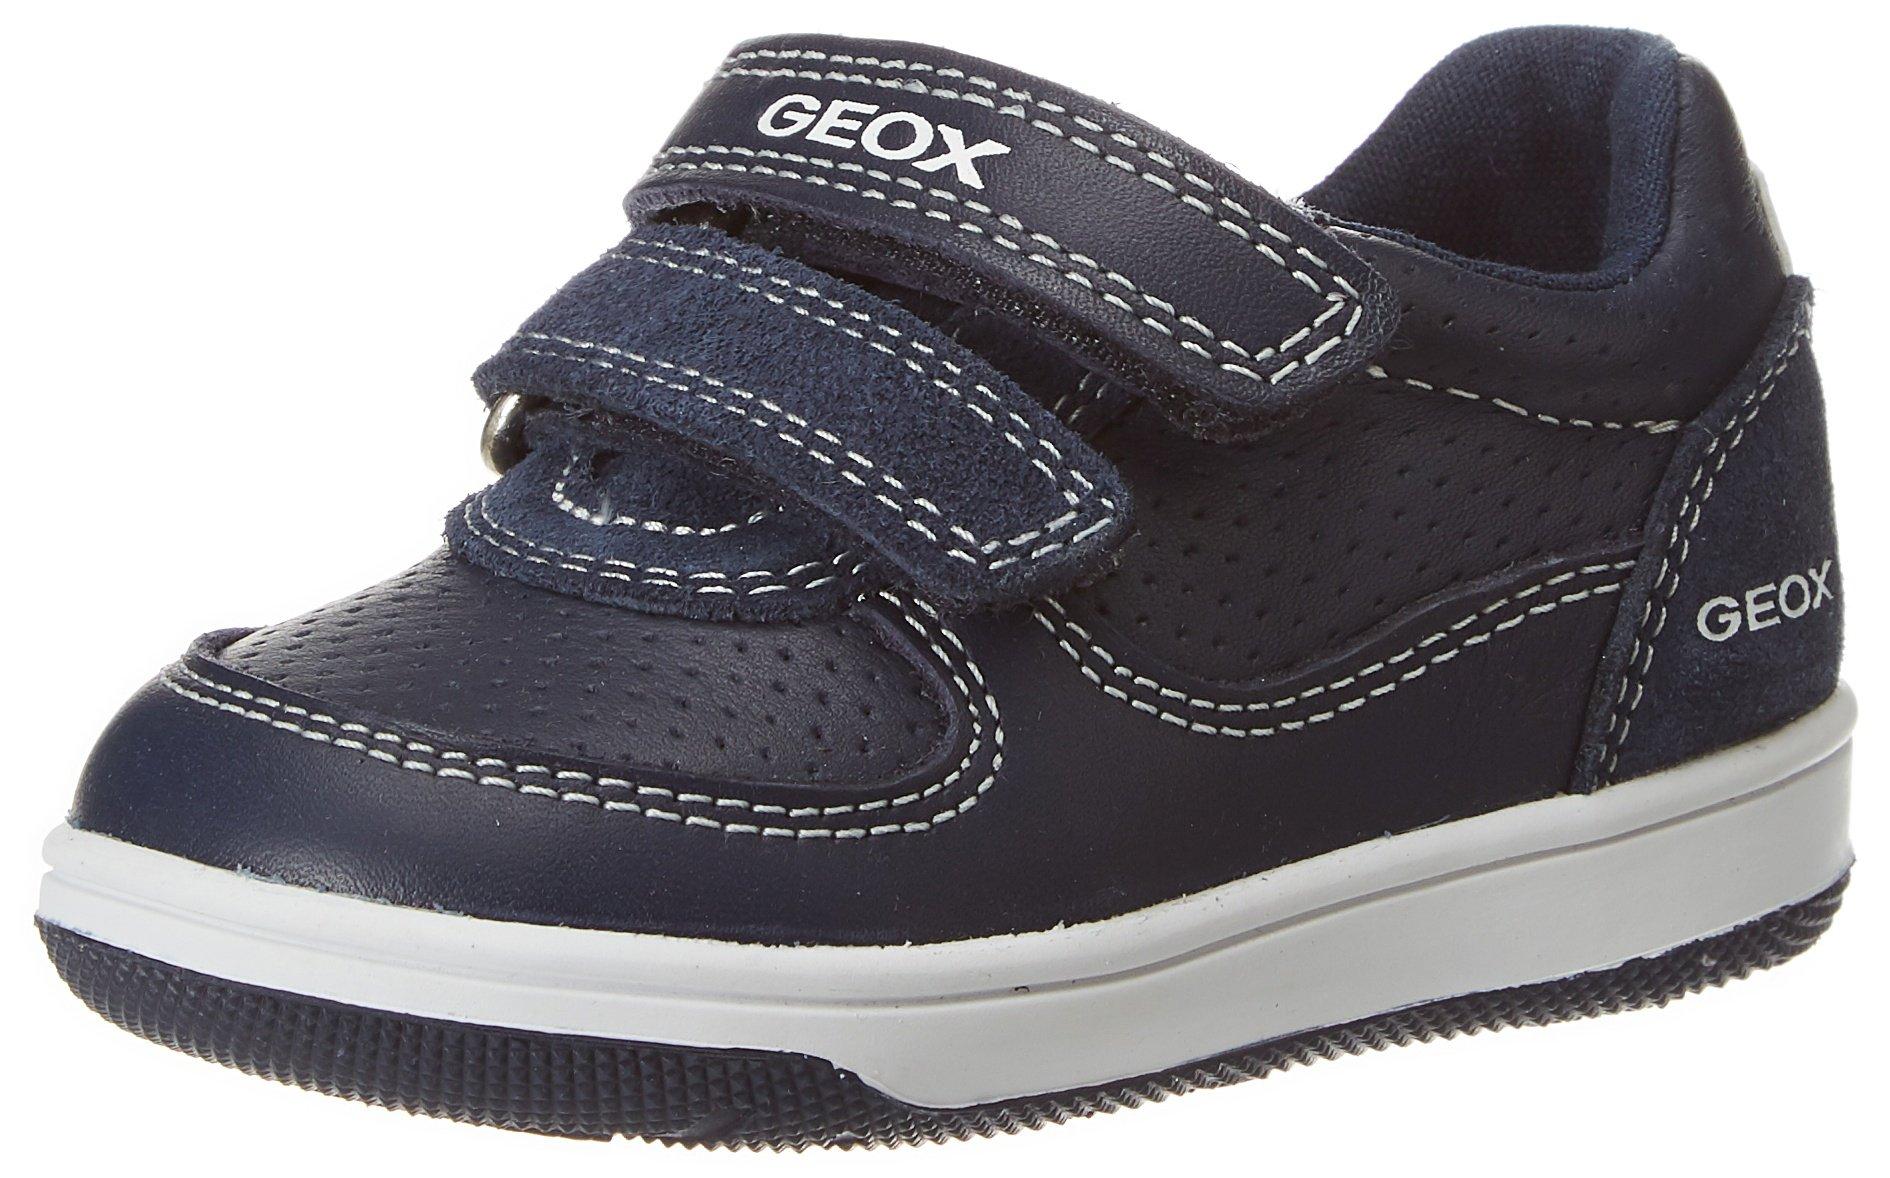 Geox B New Flick Boy B, Zapatillas para Bebés, Navy, 20 EU